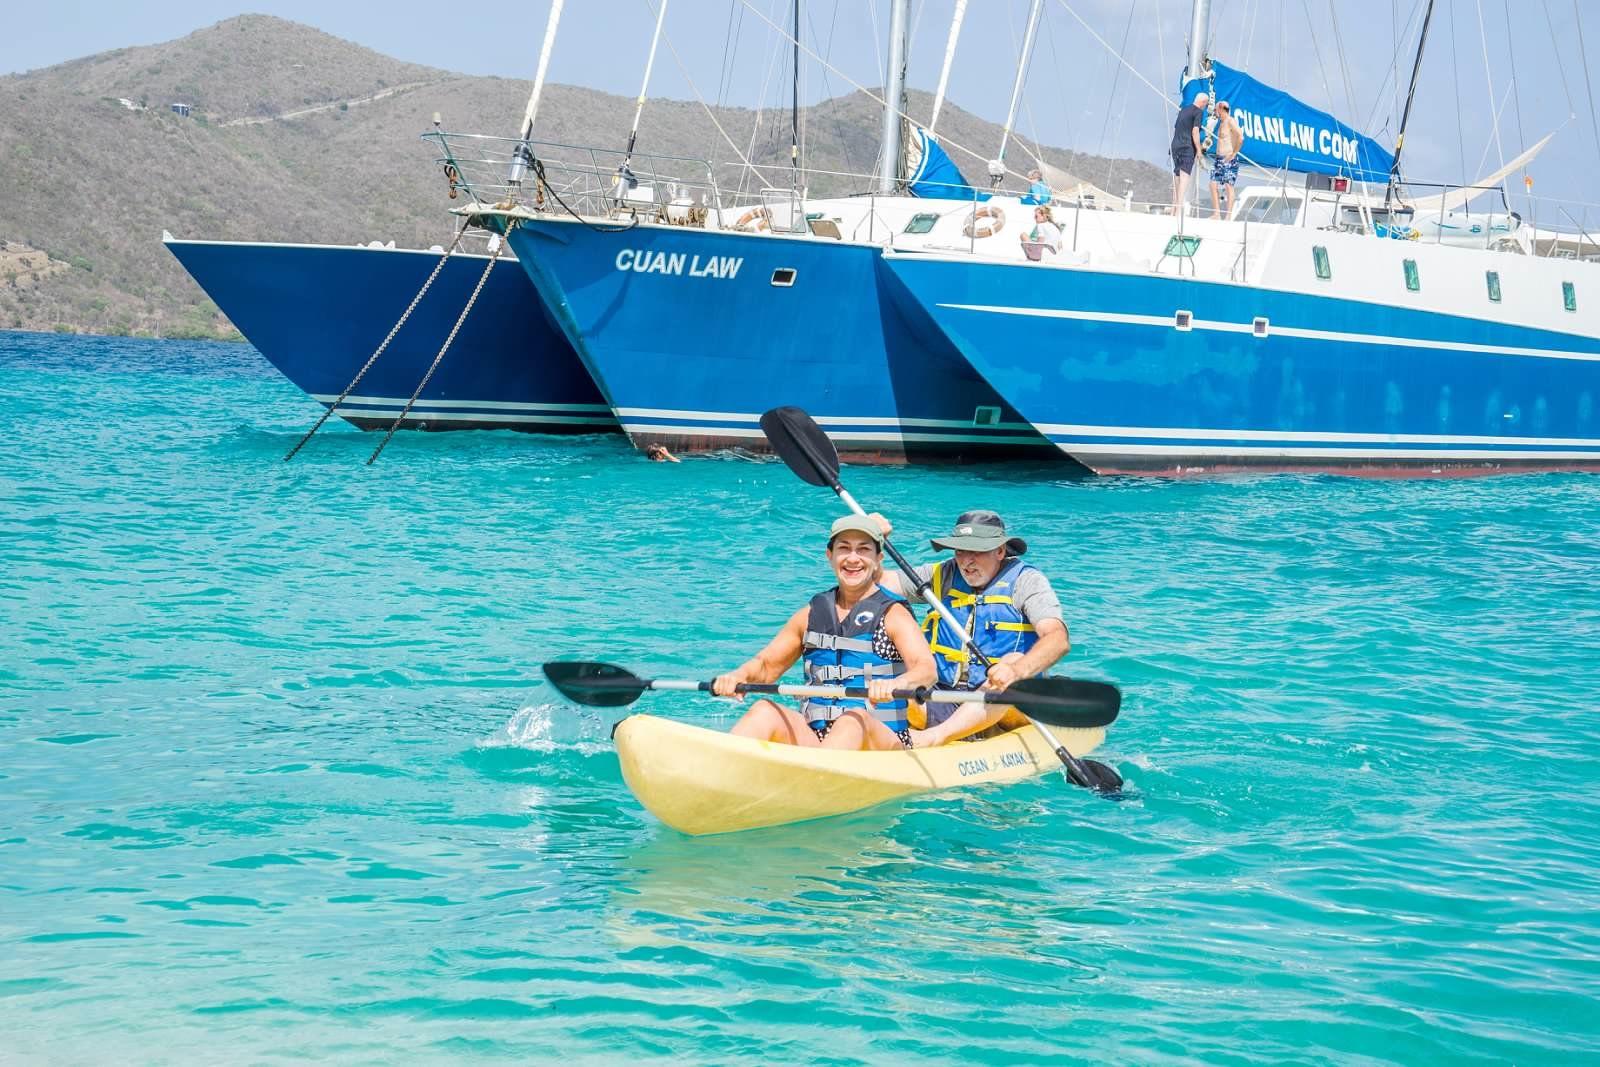 CUAN LAW Yacht Charter Details Custom CHARTERWORLD